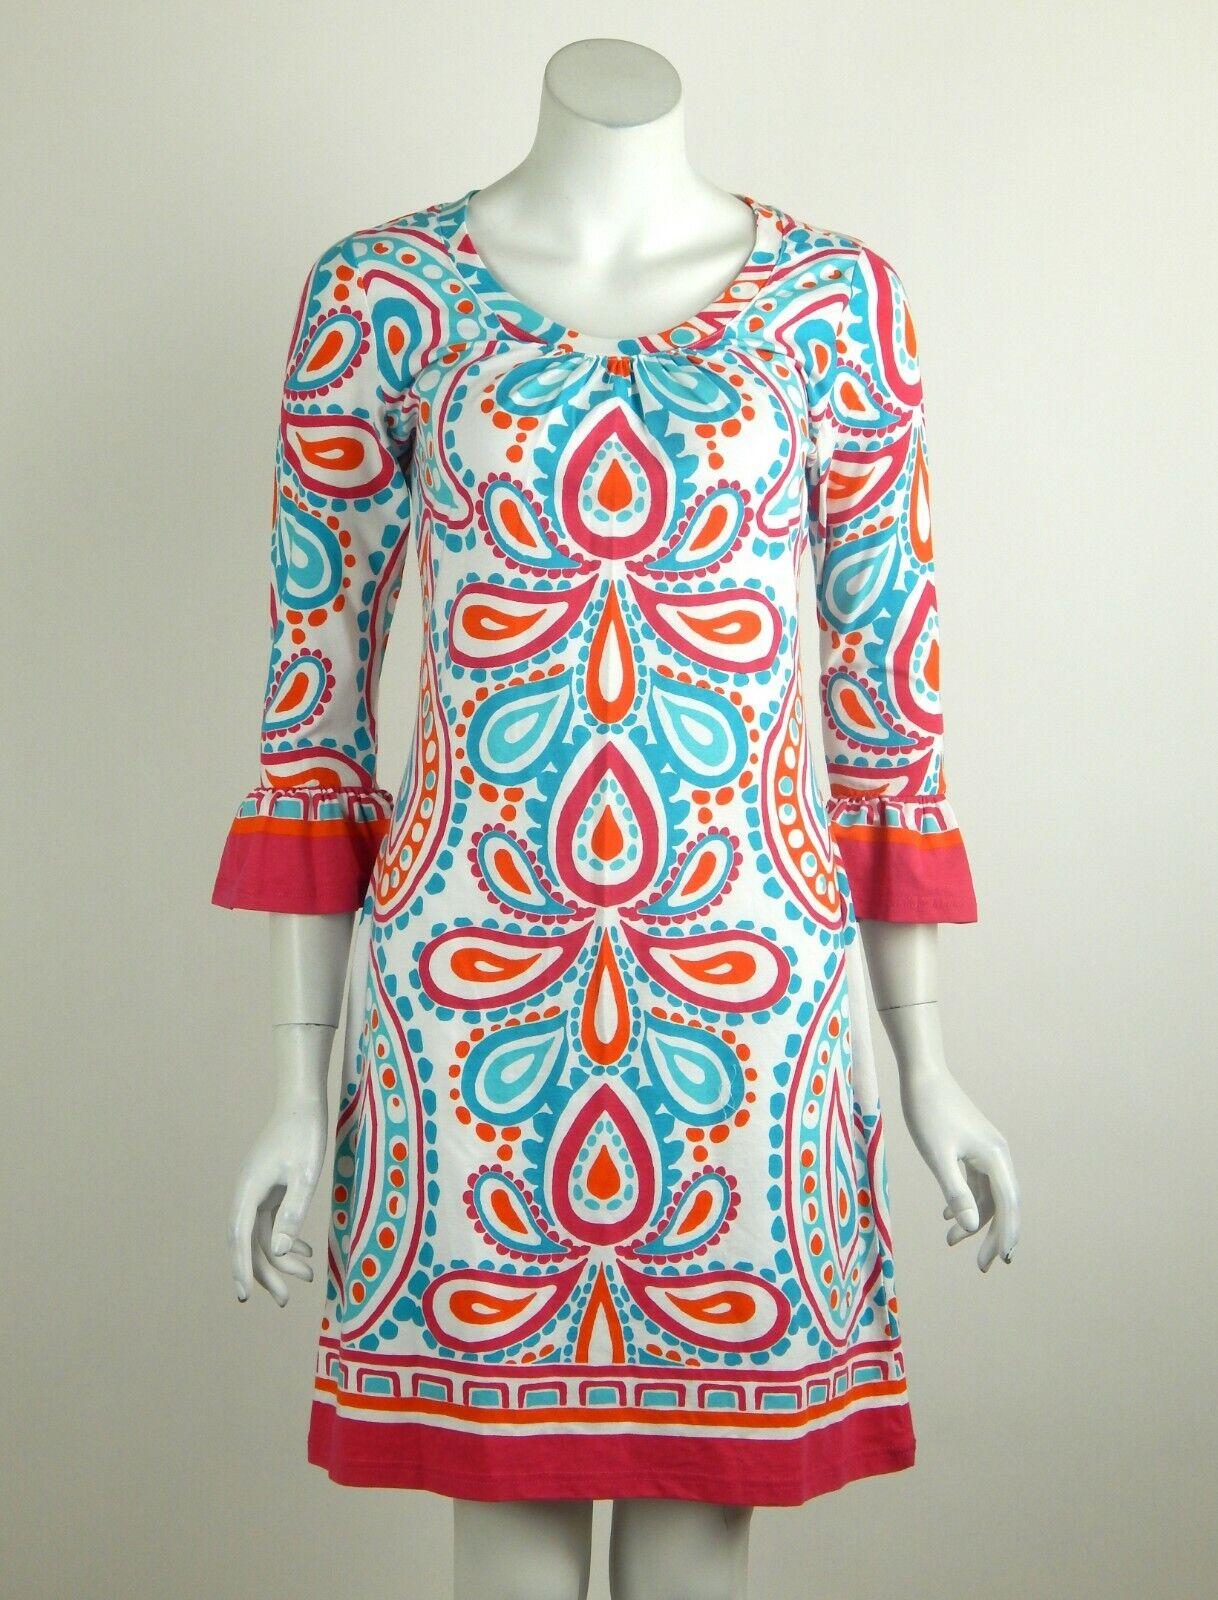 Barbara Gerwit Dress Rosa Weiß Blau Print Round Neck 3 4 Sleeves Small New